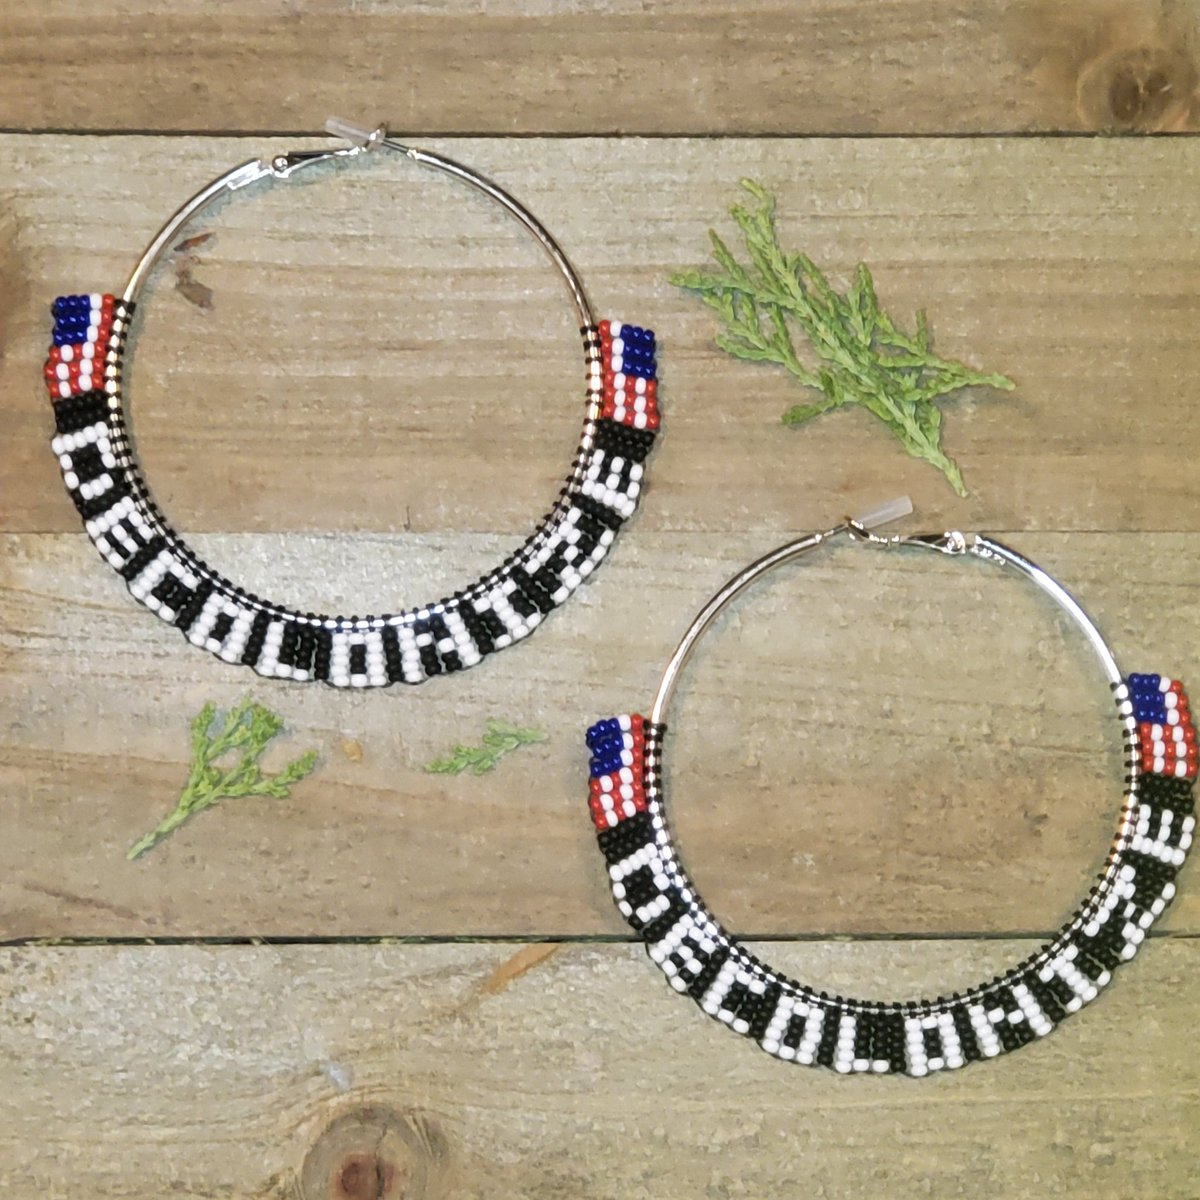 DECOLONIZE with upside down flags... beaded hoop earrings, FREE US shipping in my Etsy shop  #NativeTwitter #beadwork #AlaskaNative #FirstNations #NativeMade #Unangax #BuyNative #Statimc #Aleut #decolonize #BeadedEarrings